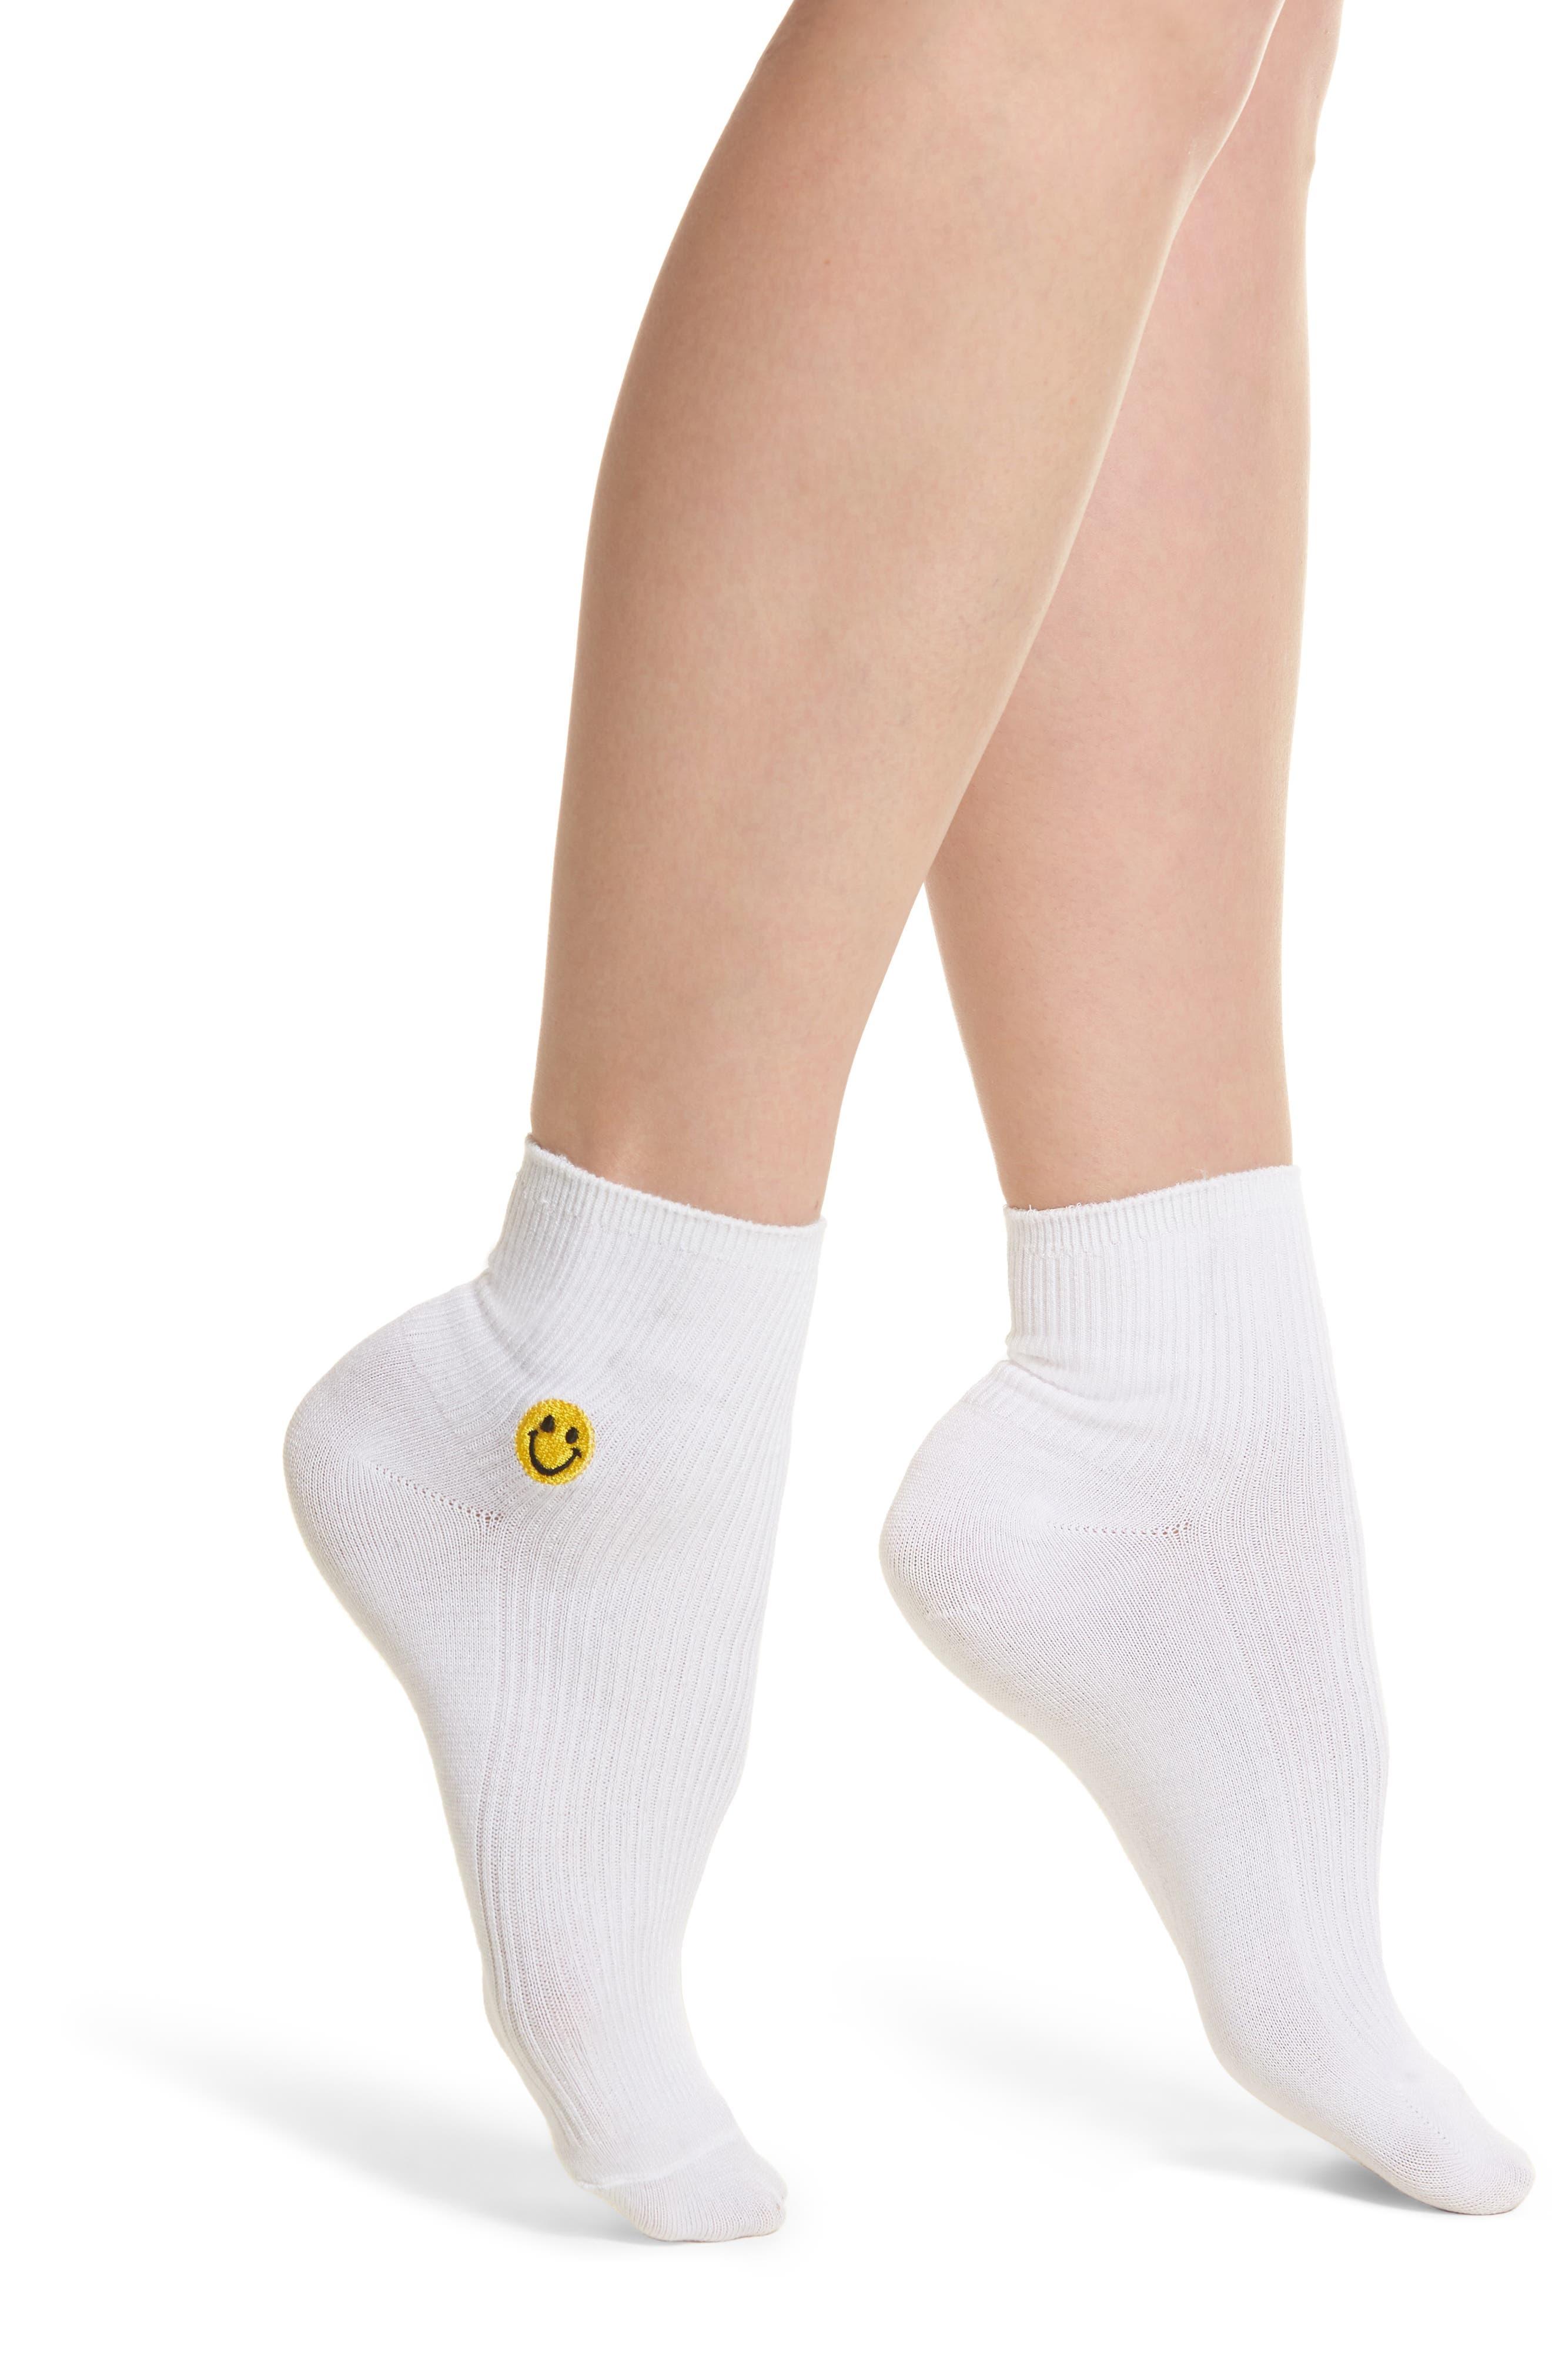 Smiles Ankle Socks,                             Main thumbnail 1, color,